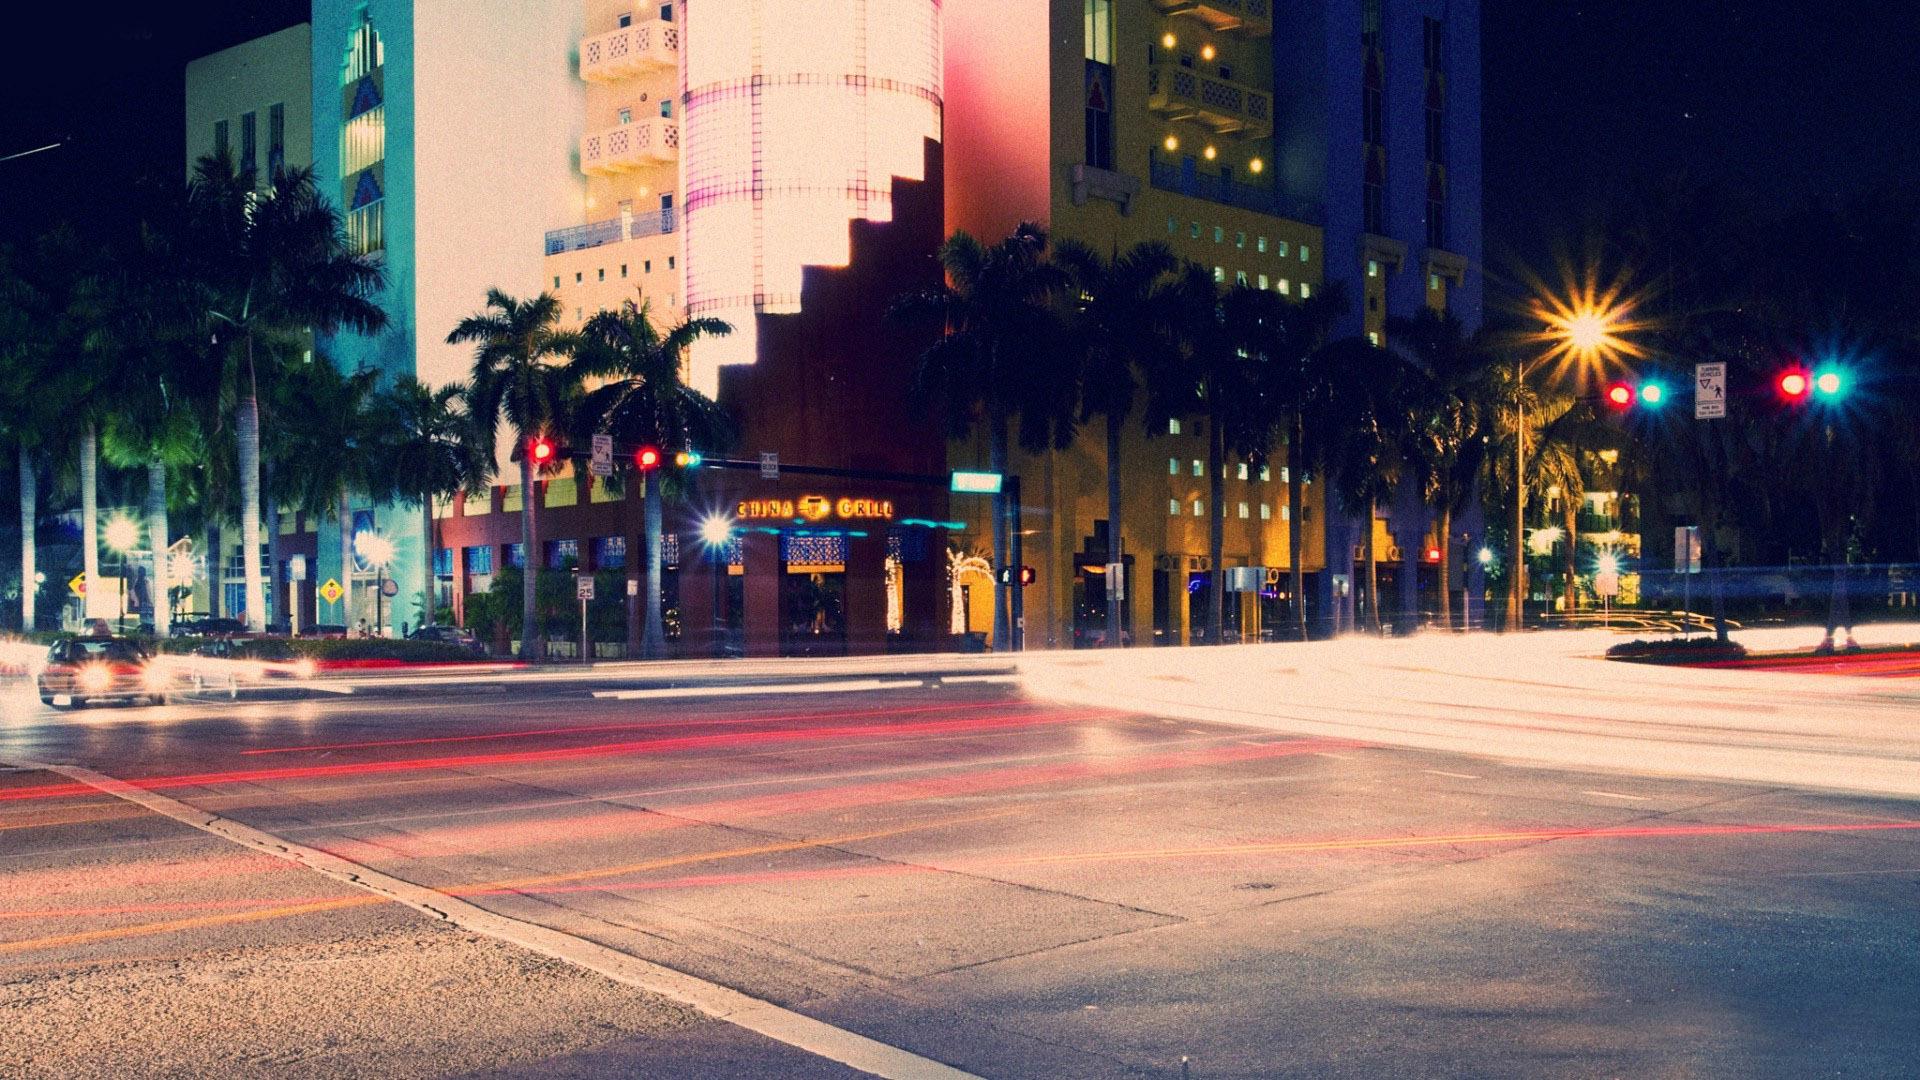 South Beach At Night Wallpaper 11971 1920x1080